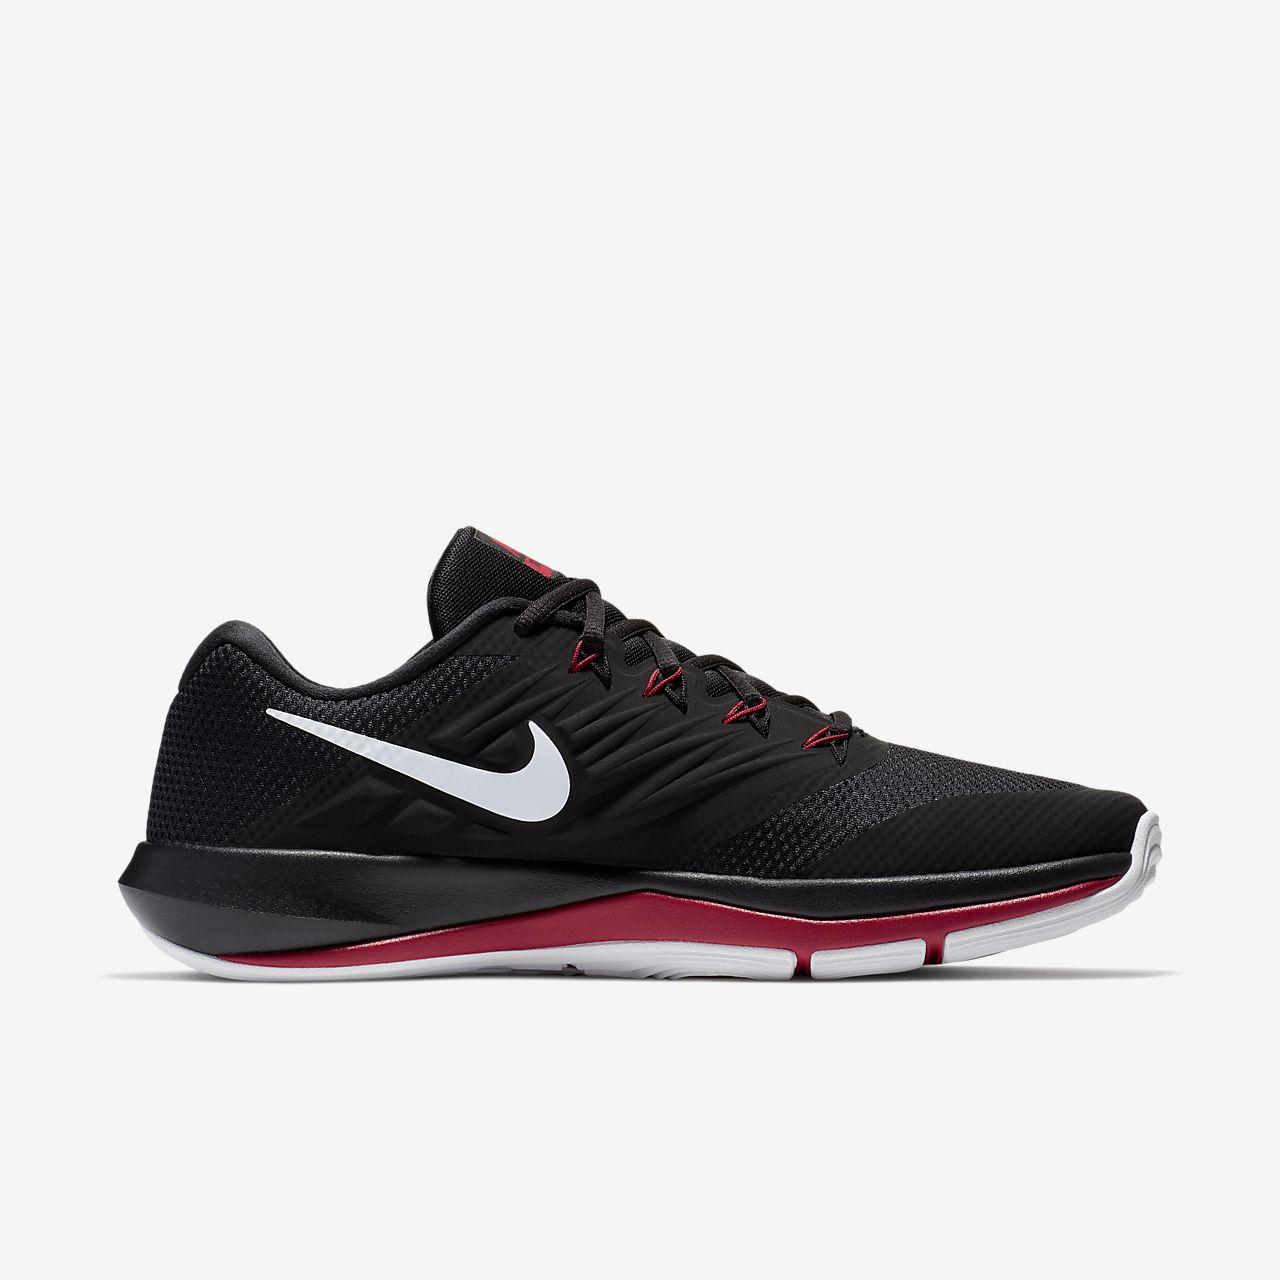 Nike Lunarlon Mens 11.5 vente fiable vente mode en ligne Iu4RC